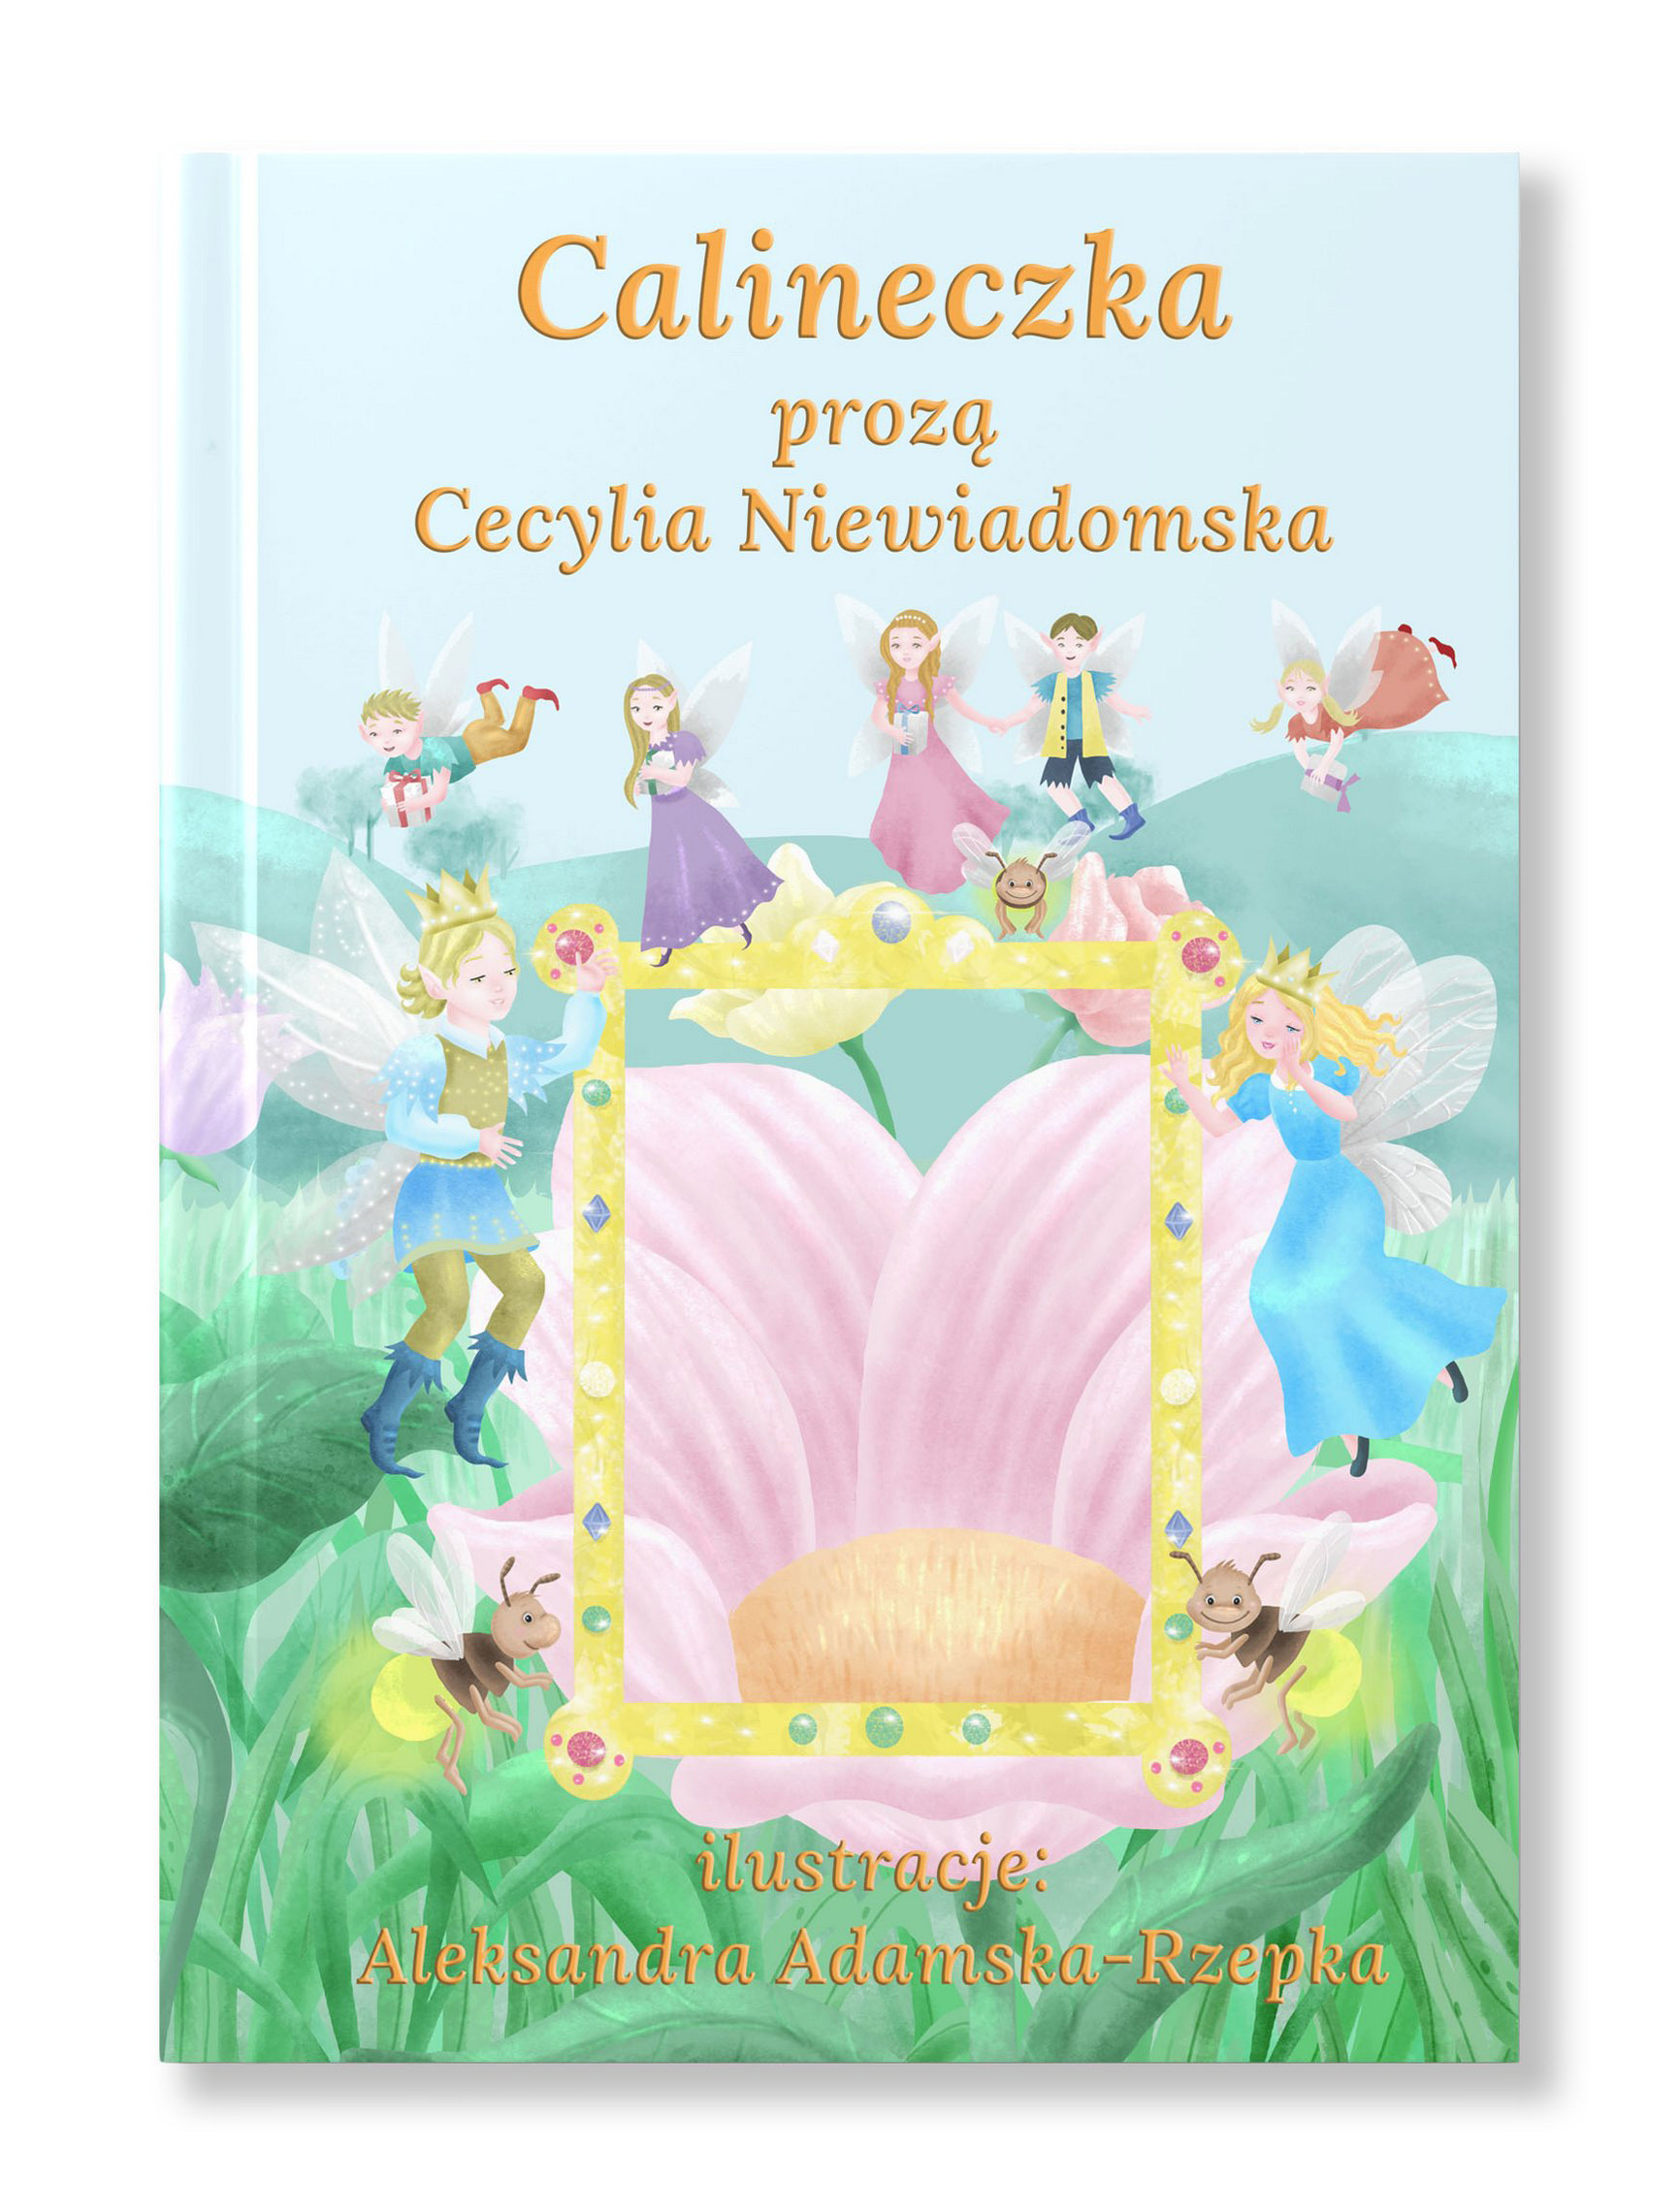 calineczka-cover-2-proza